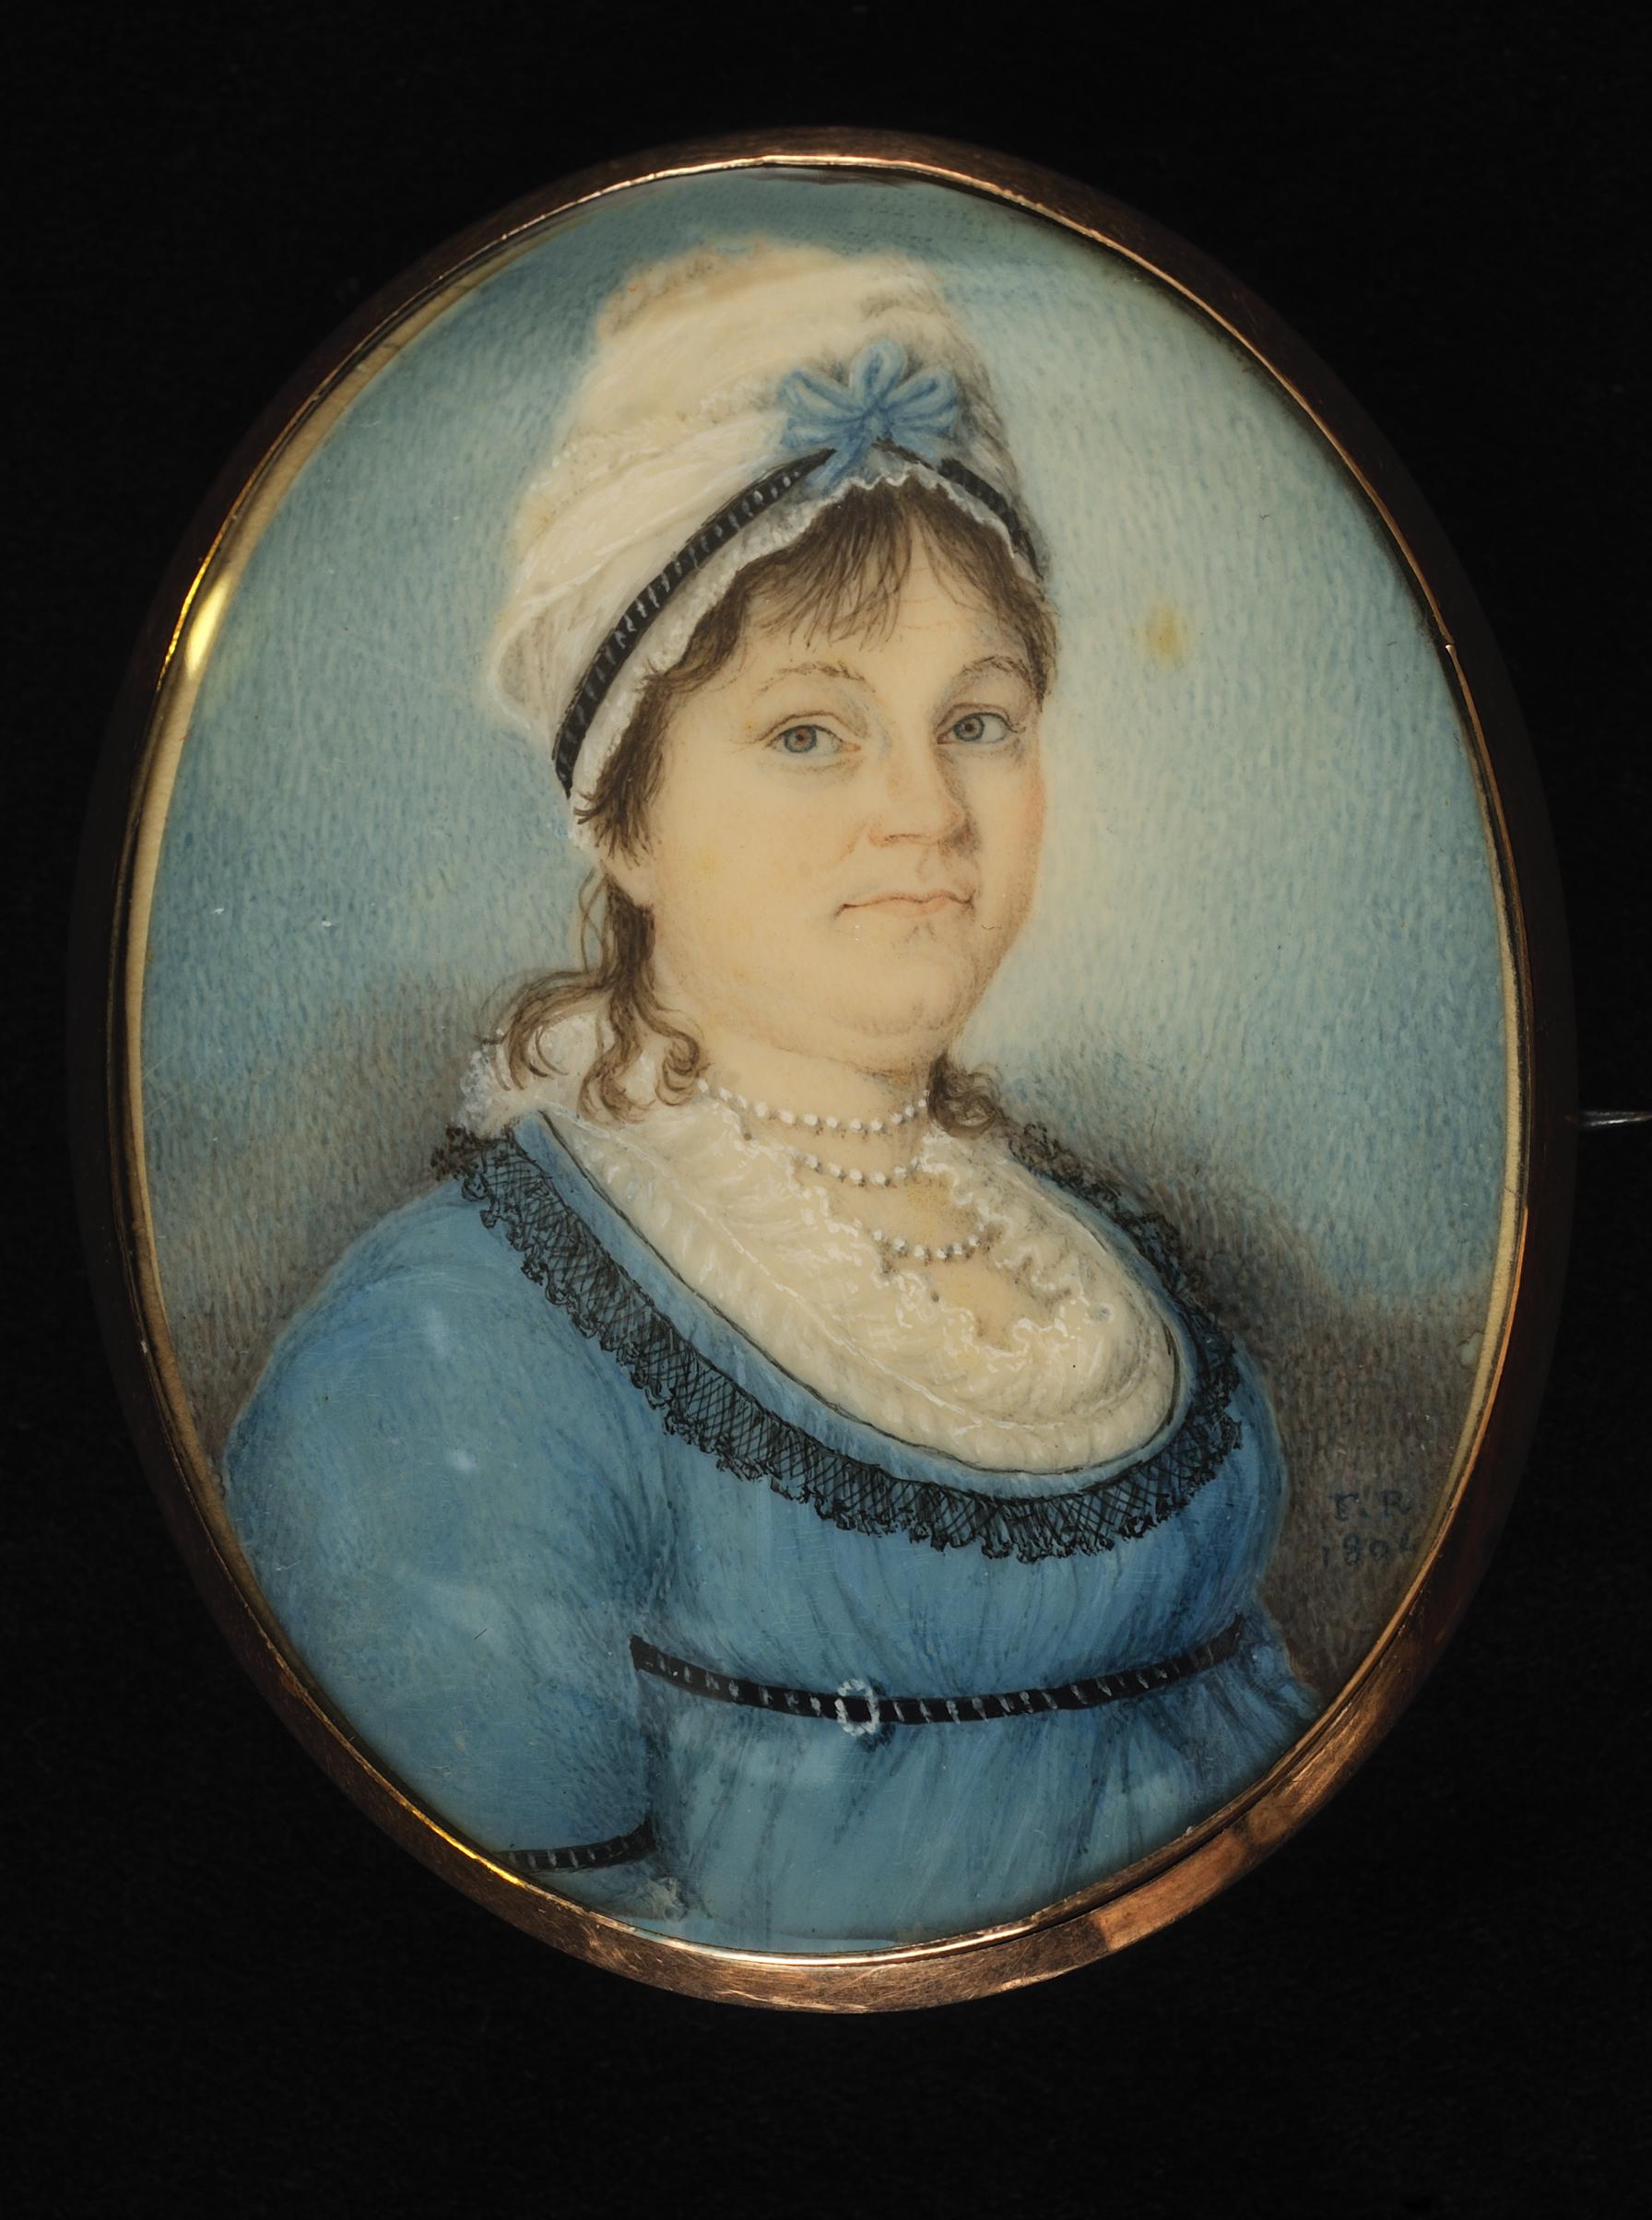 Nancy McCampbell Hays portrait miniature by Francis Rabineau, 1804